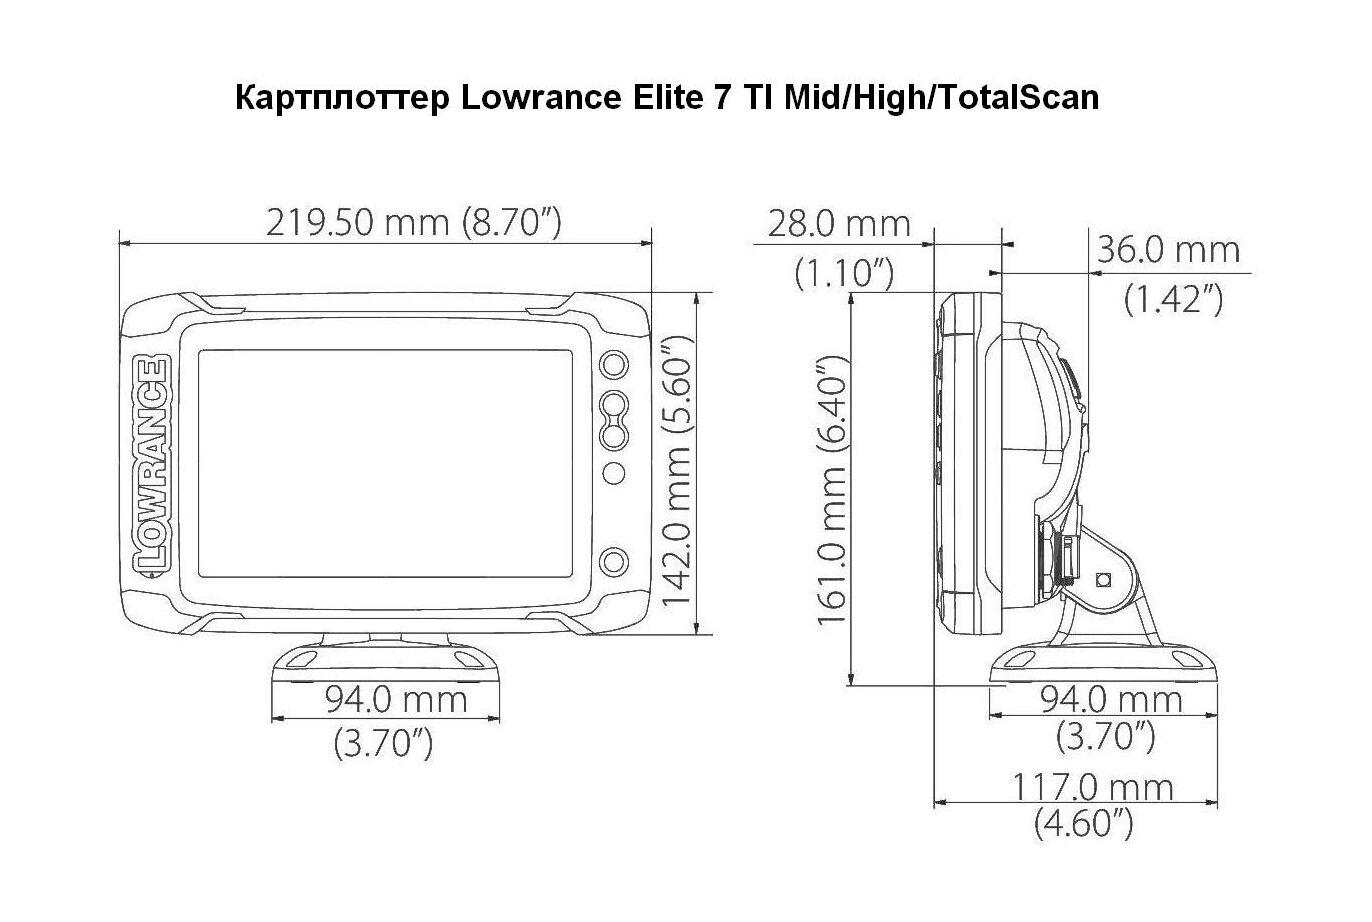 Lowrance Elite 7 Wiring Diagram Lowrance Free Wiring Diagrams – Lowrance Wiring Schematic